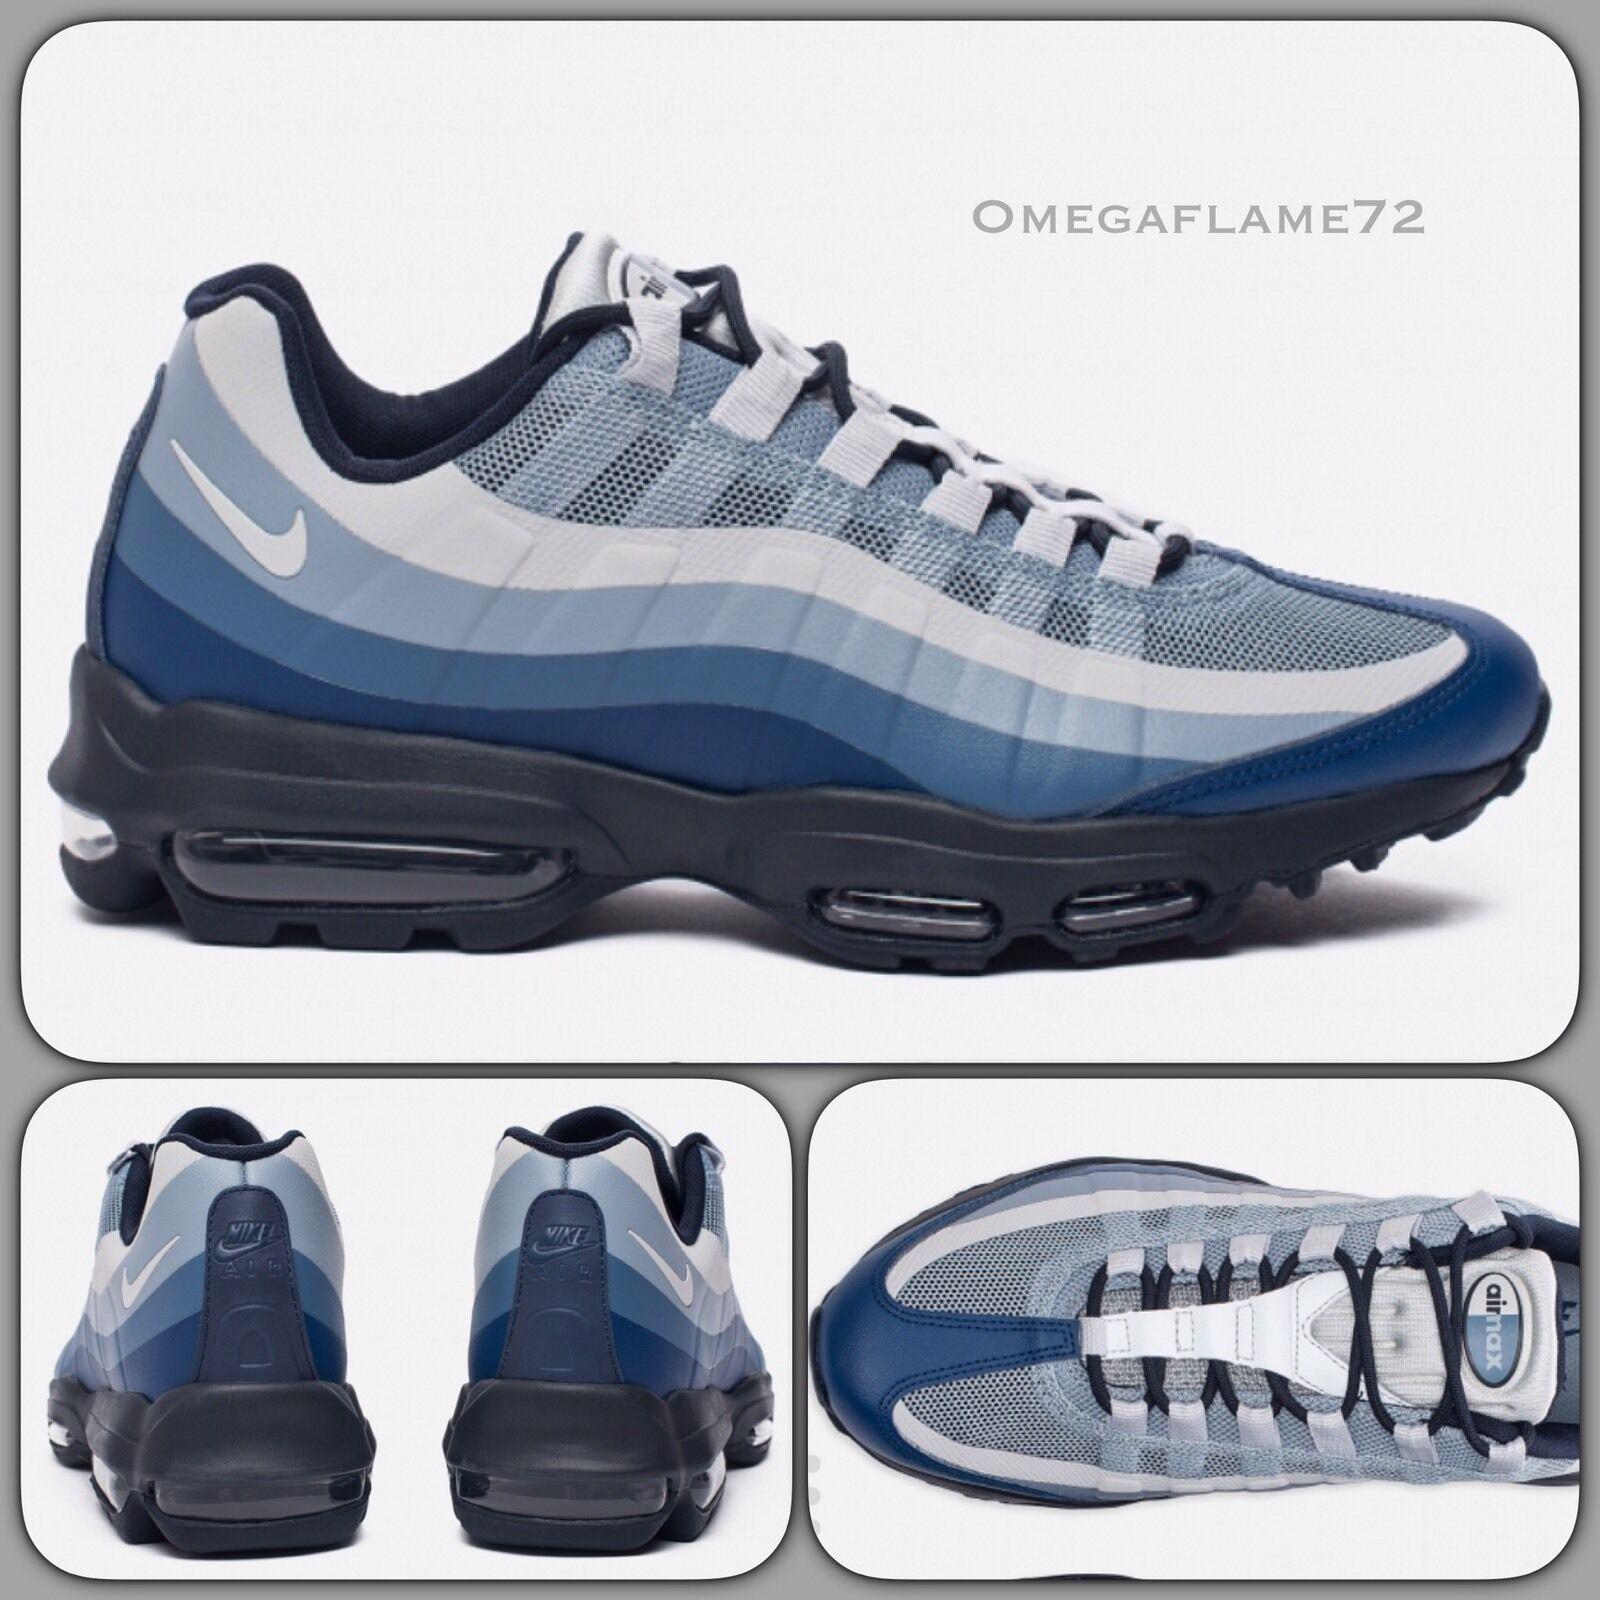 Nike Air Max 95 Ultra SE 857910-400 Coastal Blau Sz U.K. 10, EU 45, USA 11